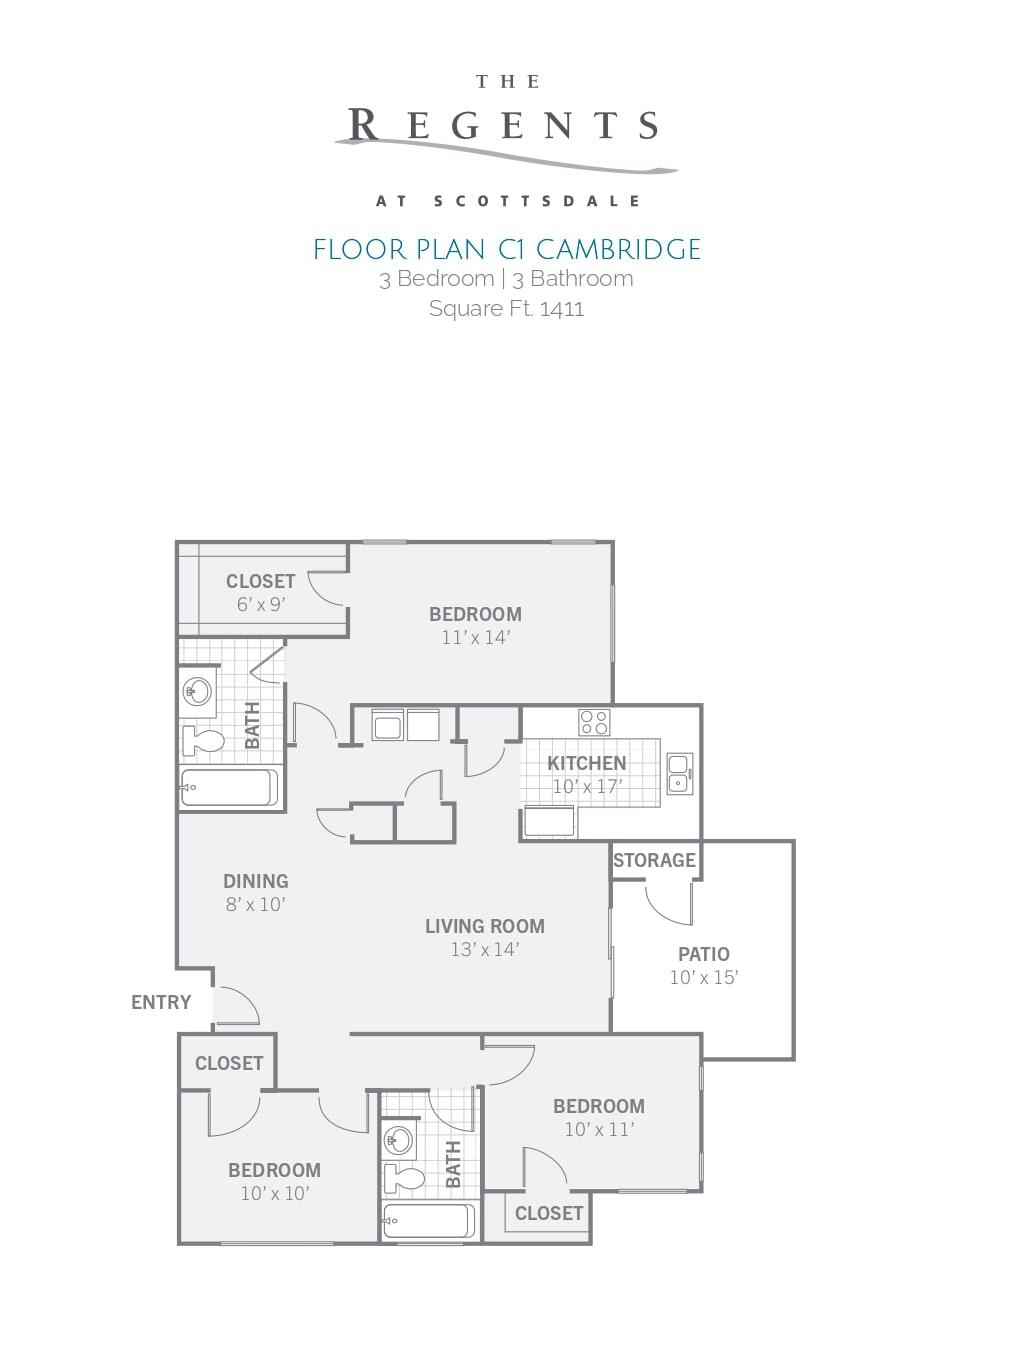 3 Bedroom   3 Bathroom Square Ft. 1411